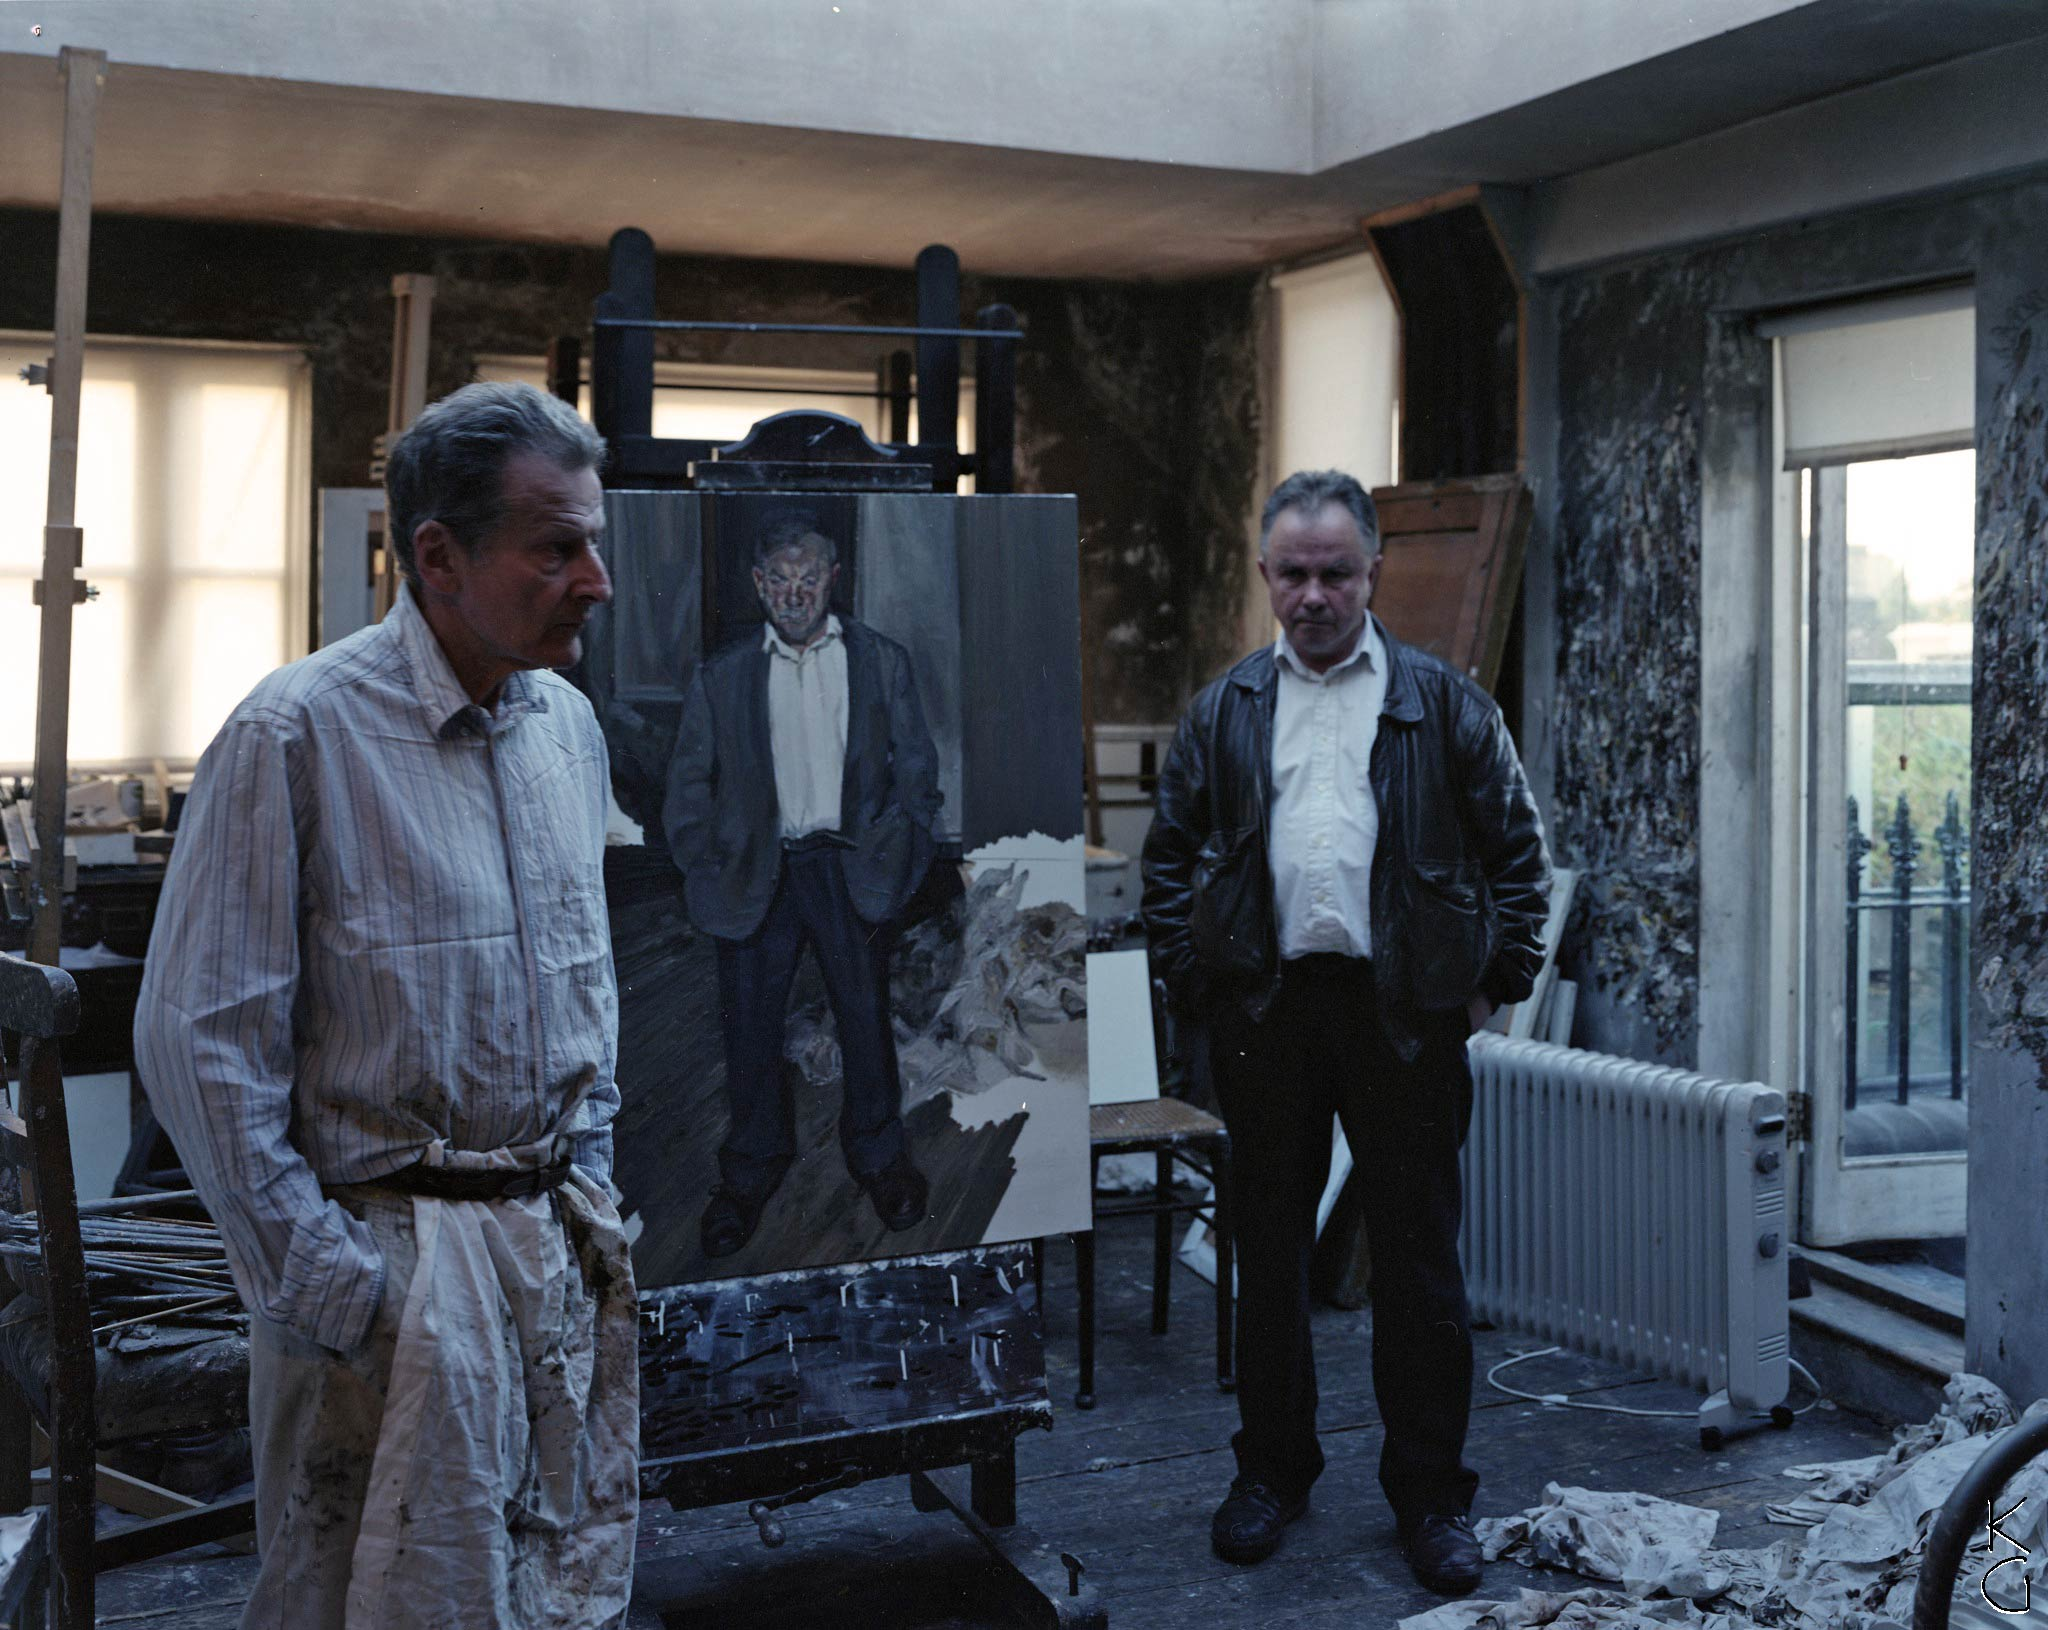 Photograph of Lucian Freud and Bruce Bernard, by Ken Griffiths